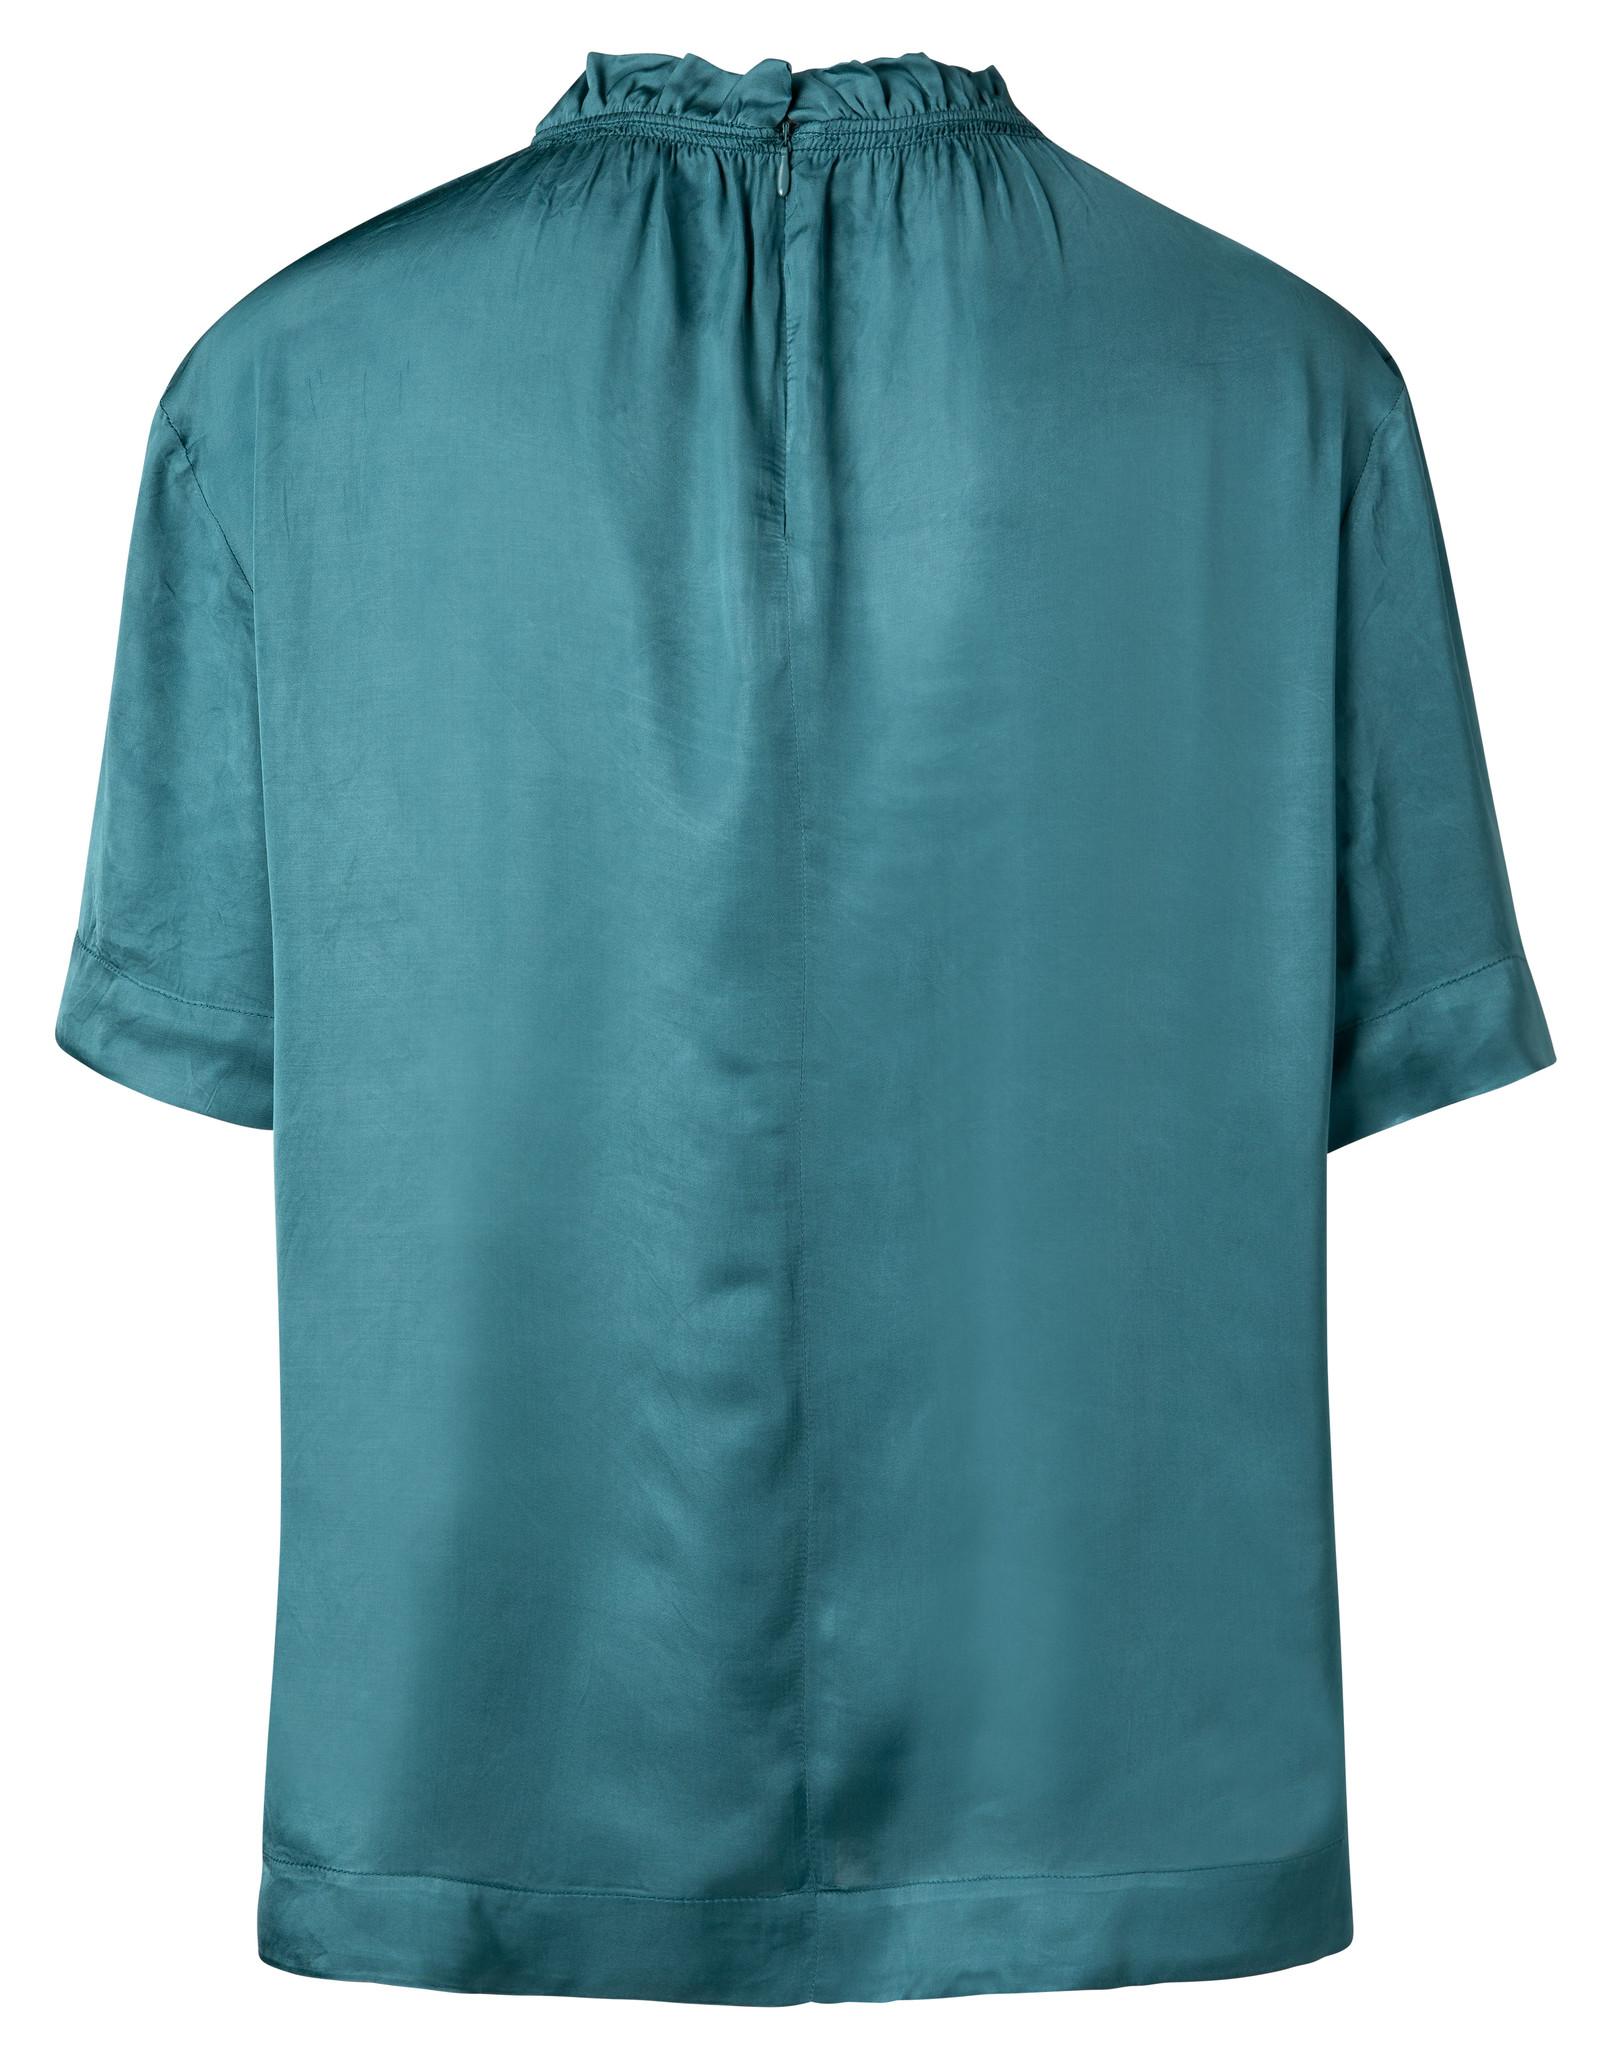 yaya Smocked neckline top 1901393-112-3